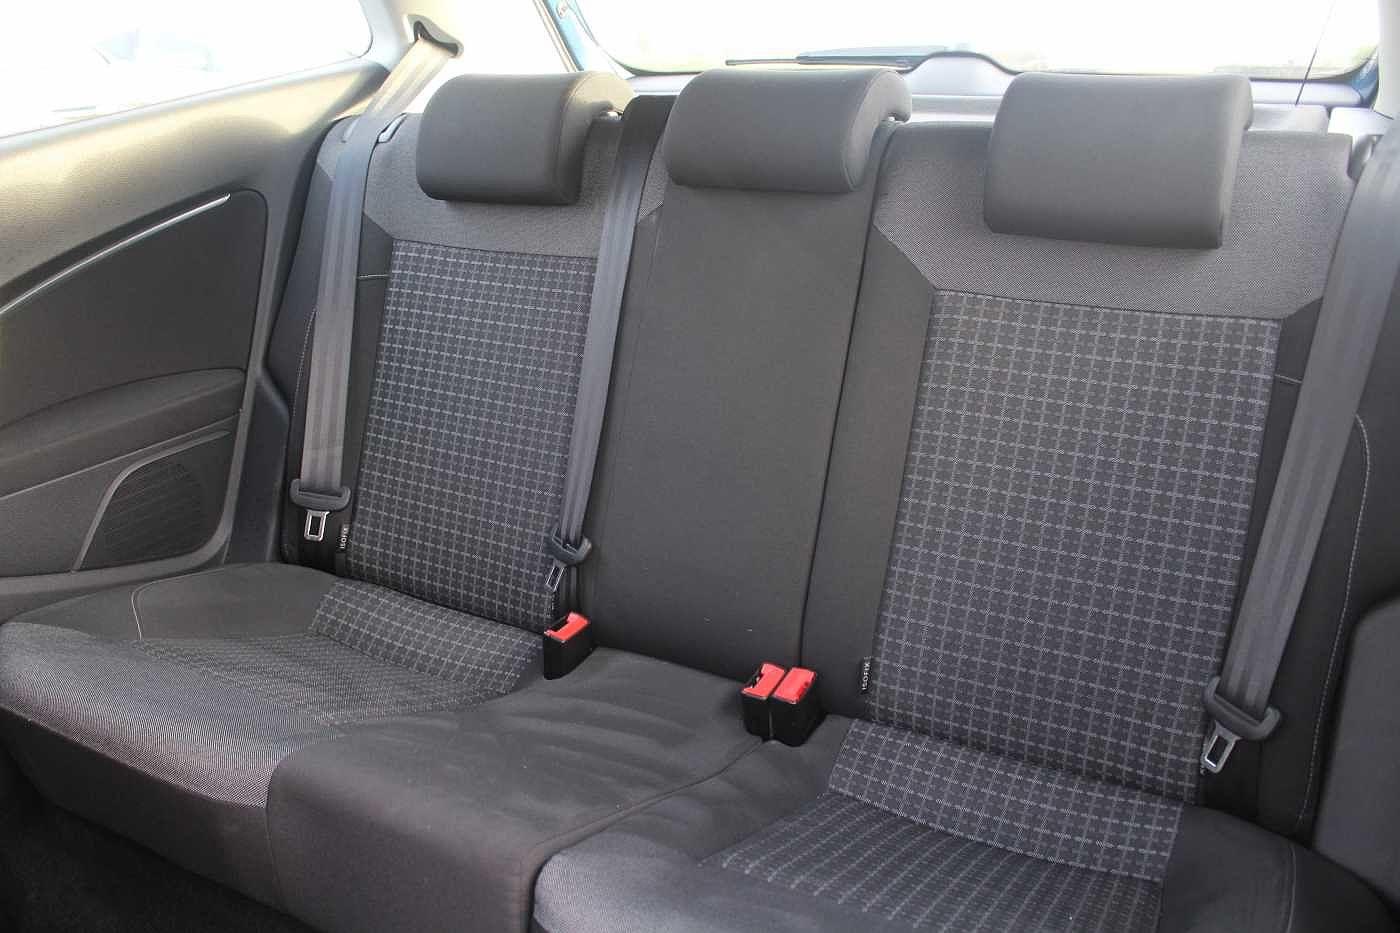 Volkswagen Polo 1.0 SE (60 PS) (s/s)